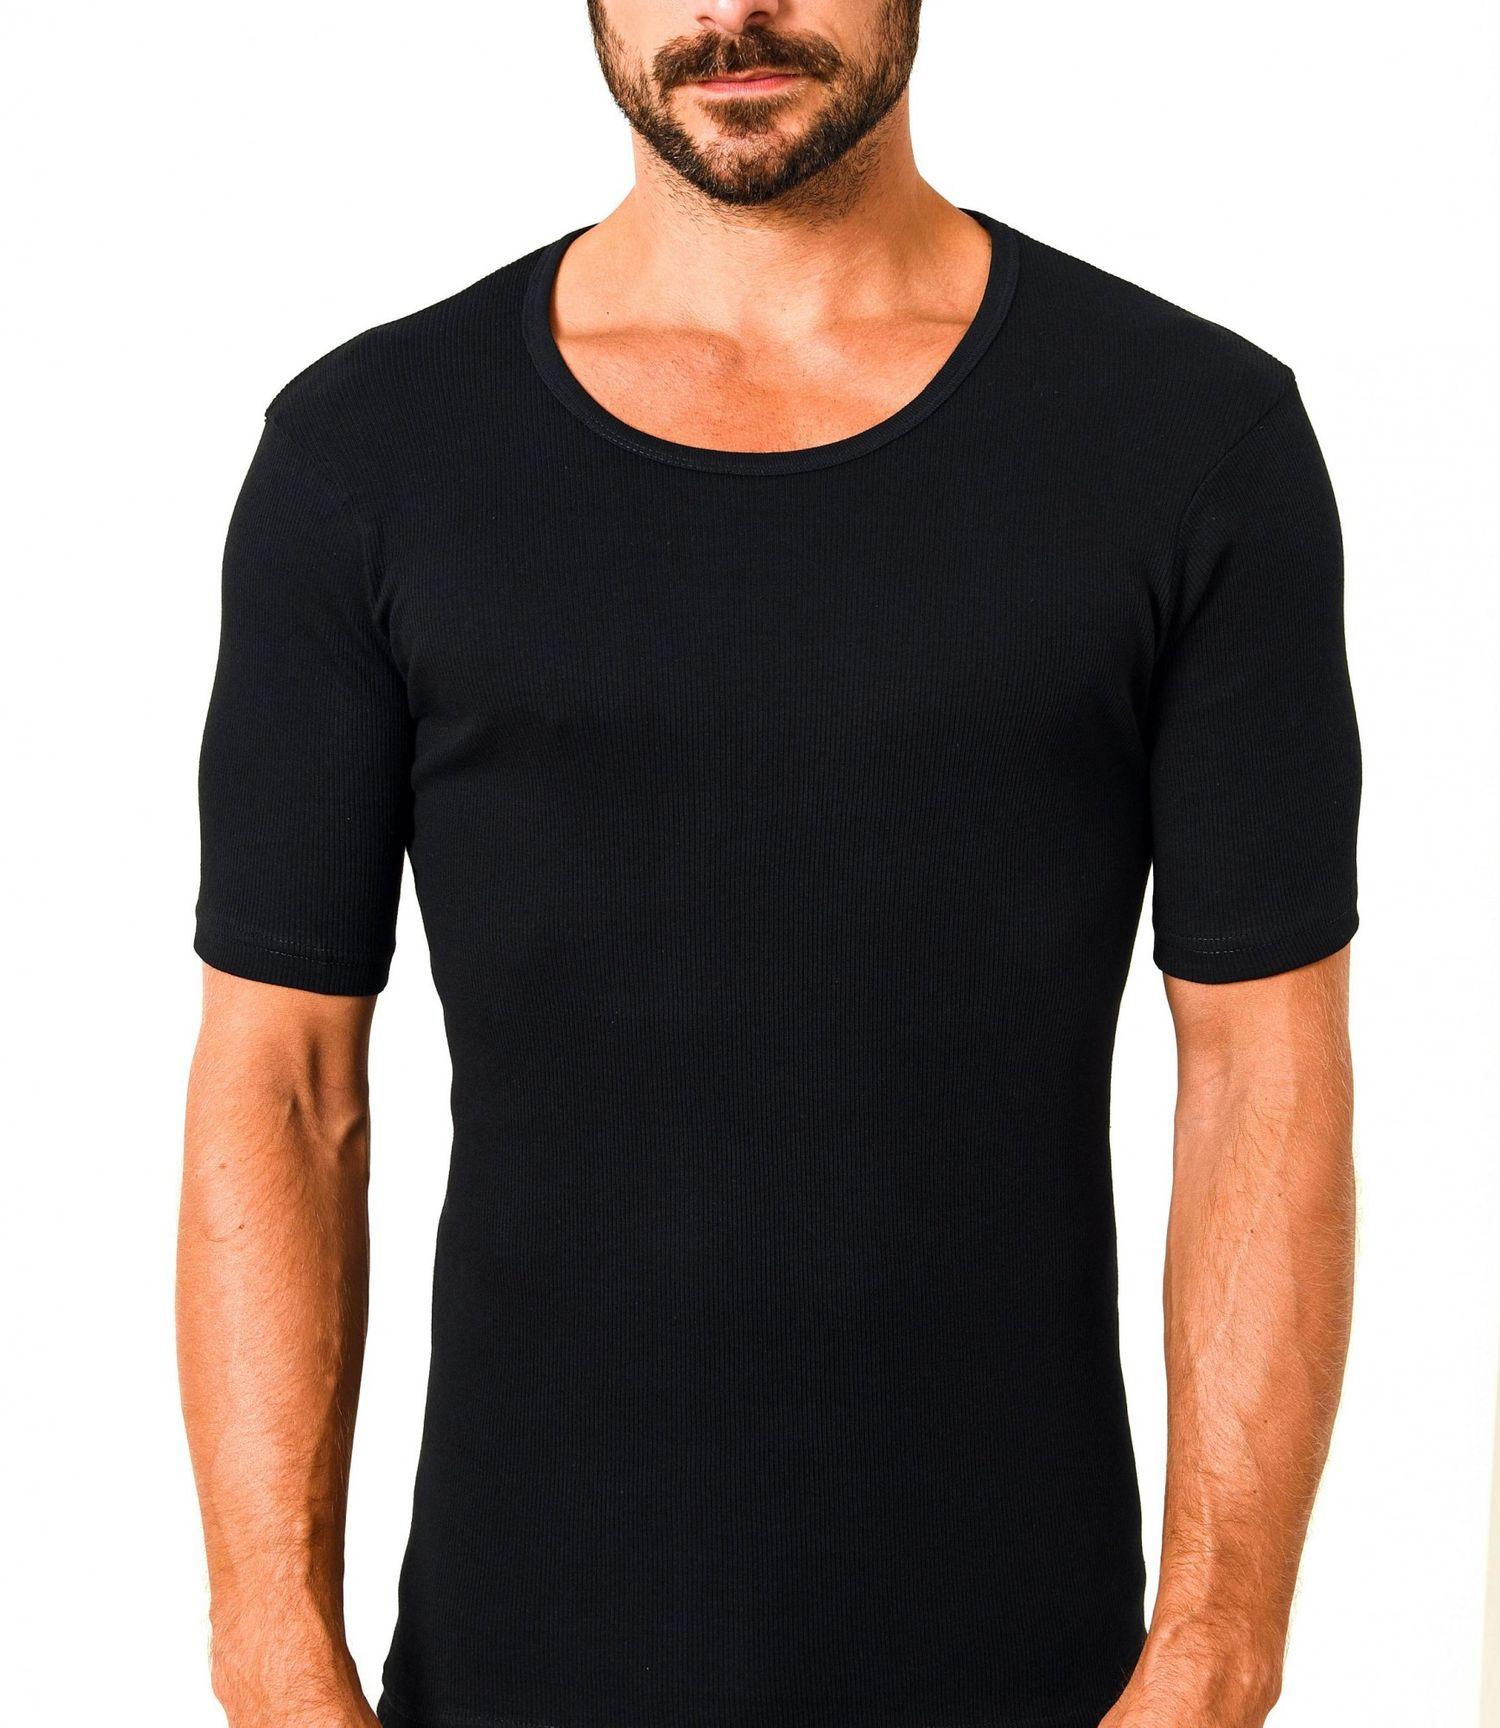 10427 Herren Unterhemd kurzarm 1/2-Arm Doppelripp 2erpack schwarz – Bild 1